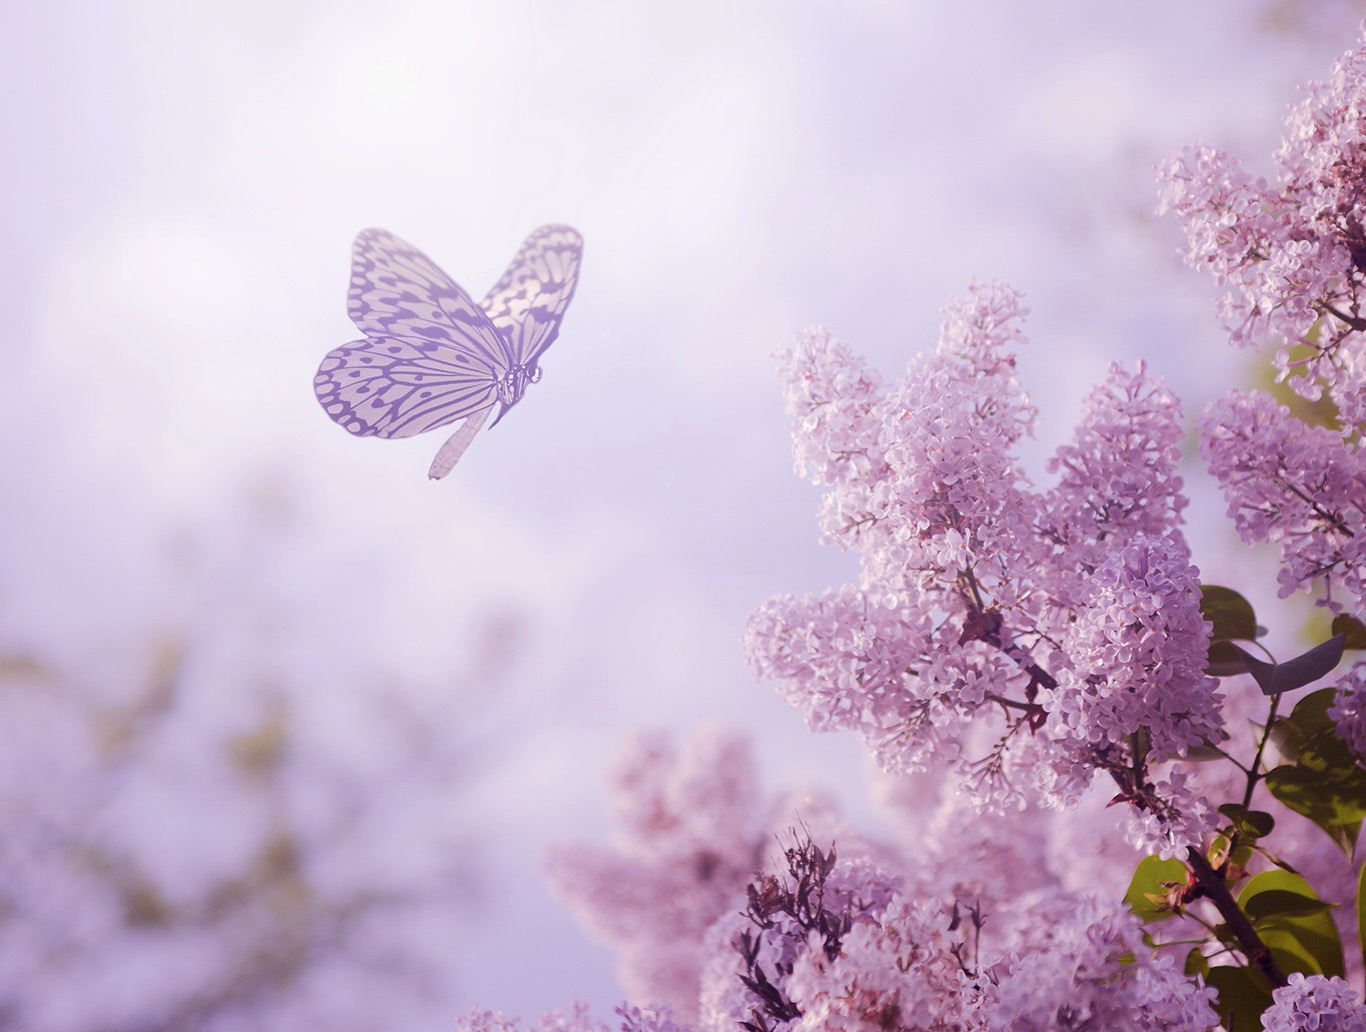 Canvas Print - Butterfly & Flower